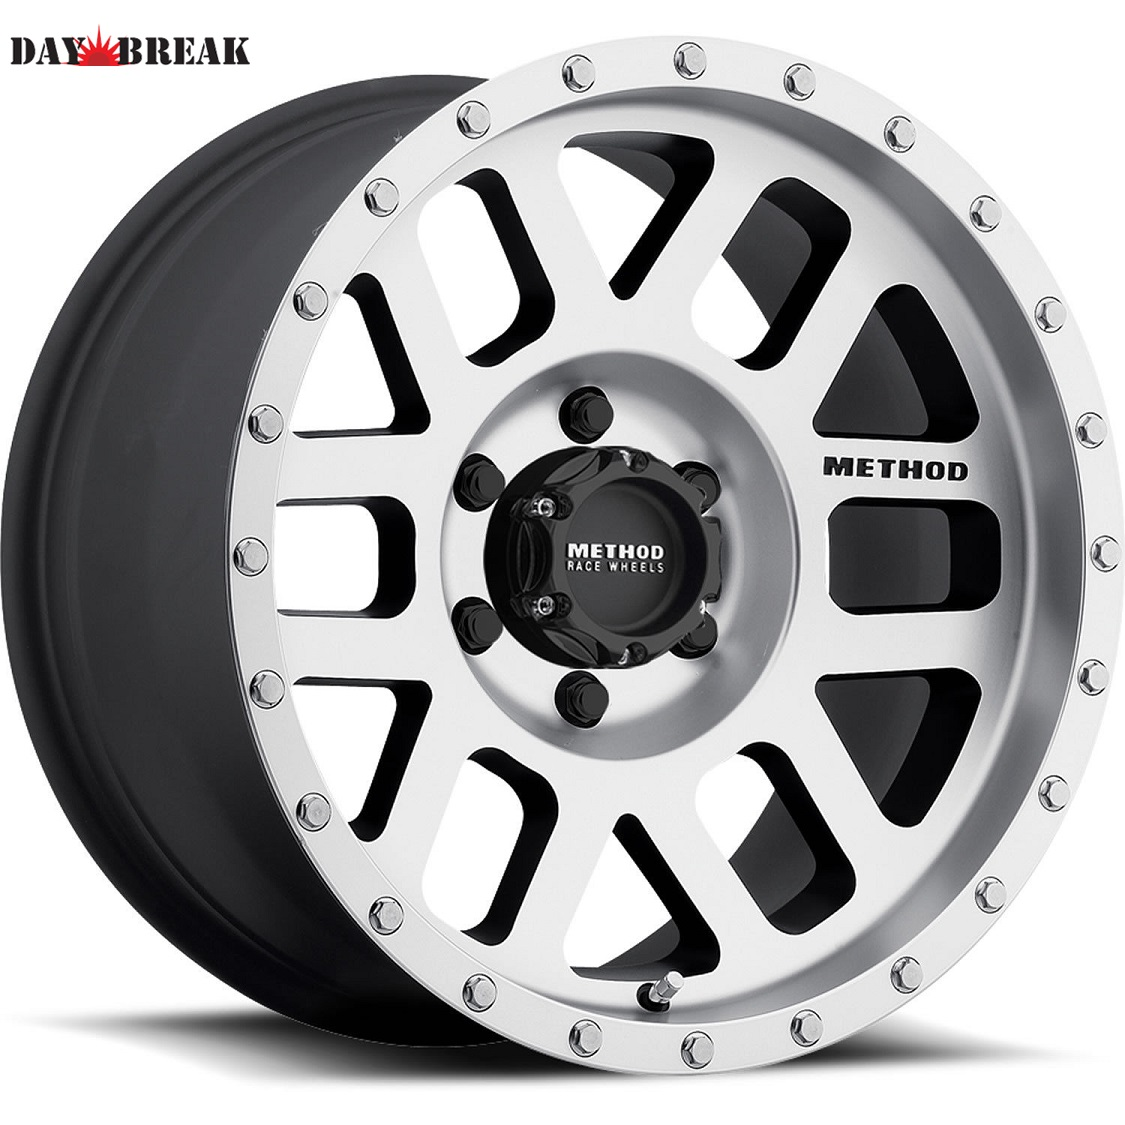 20x9 Machined Black Method Mesh5x150 +18 LT35x12.50R20 Tires 35インチタイヤ 20インチホイール セット[2007~タンドラ][2008~セコイア][ランクル200][アメ車][逆輸入車][デイブレイク]